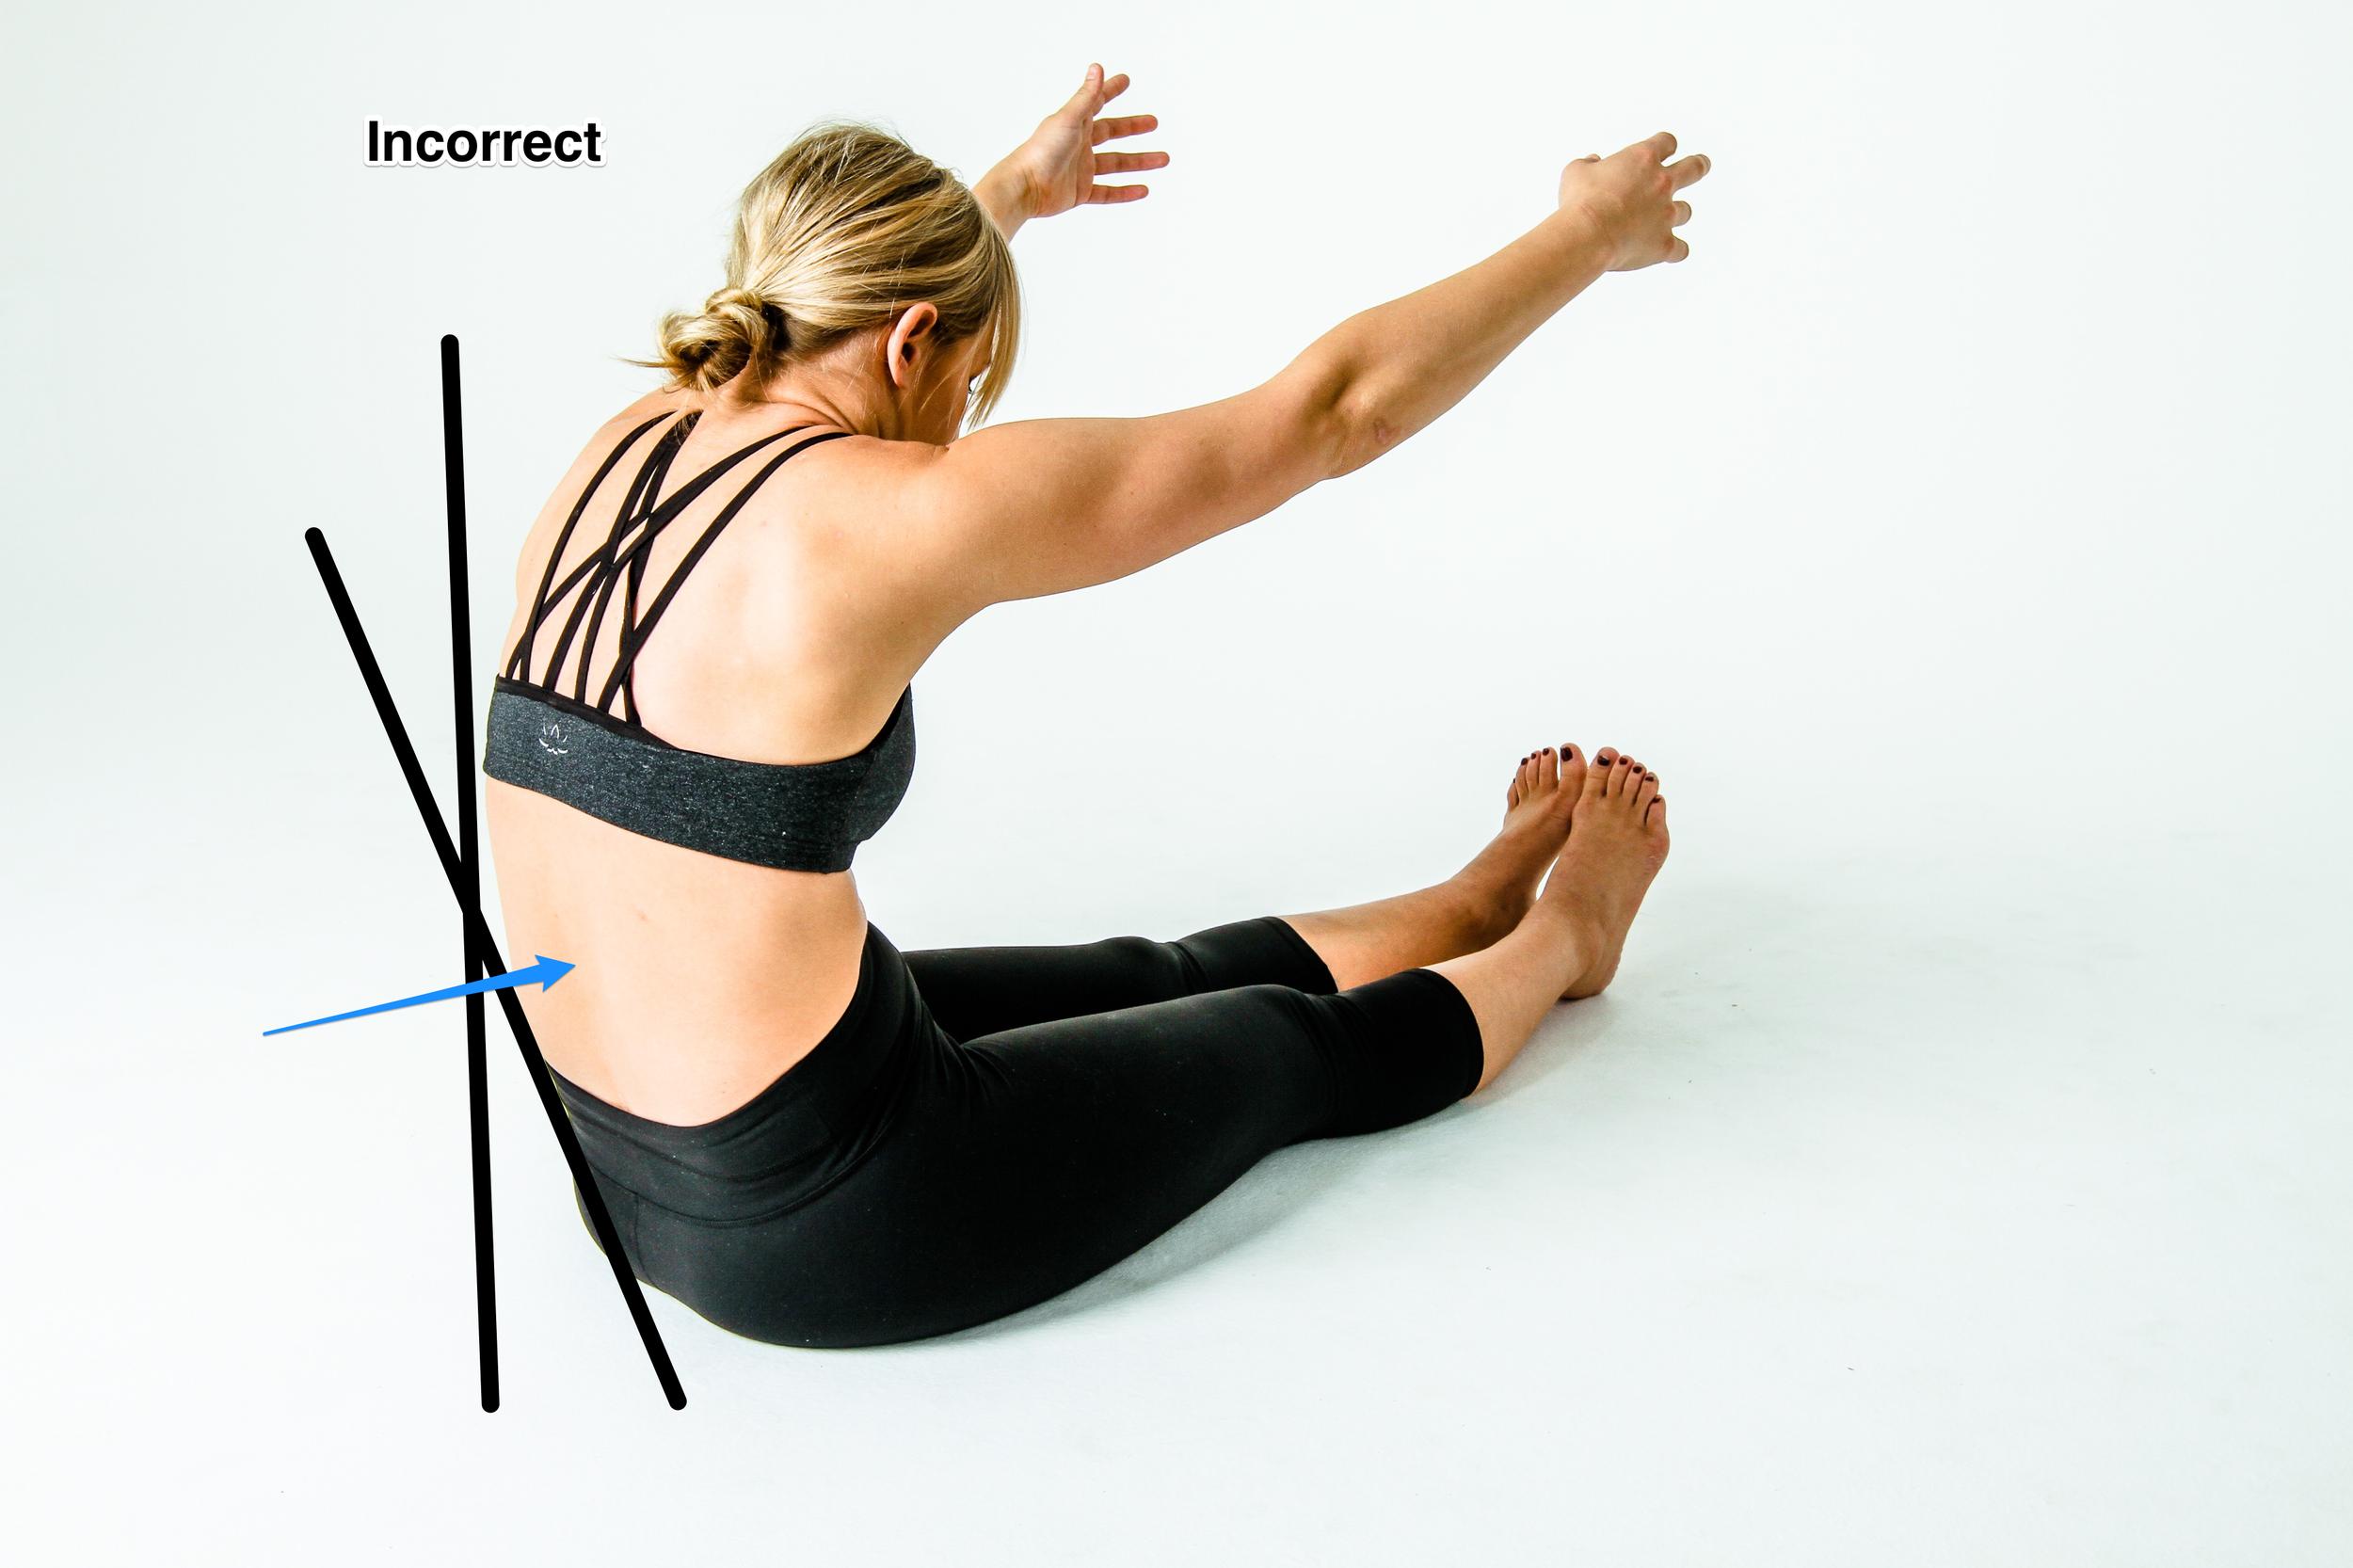 Posterior Pelvic Tilt during a Hamstring Stretch